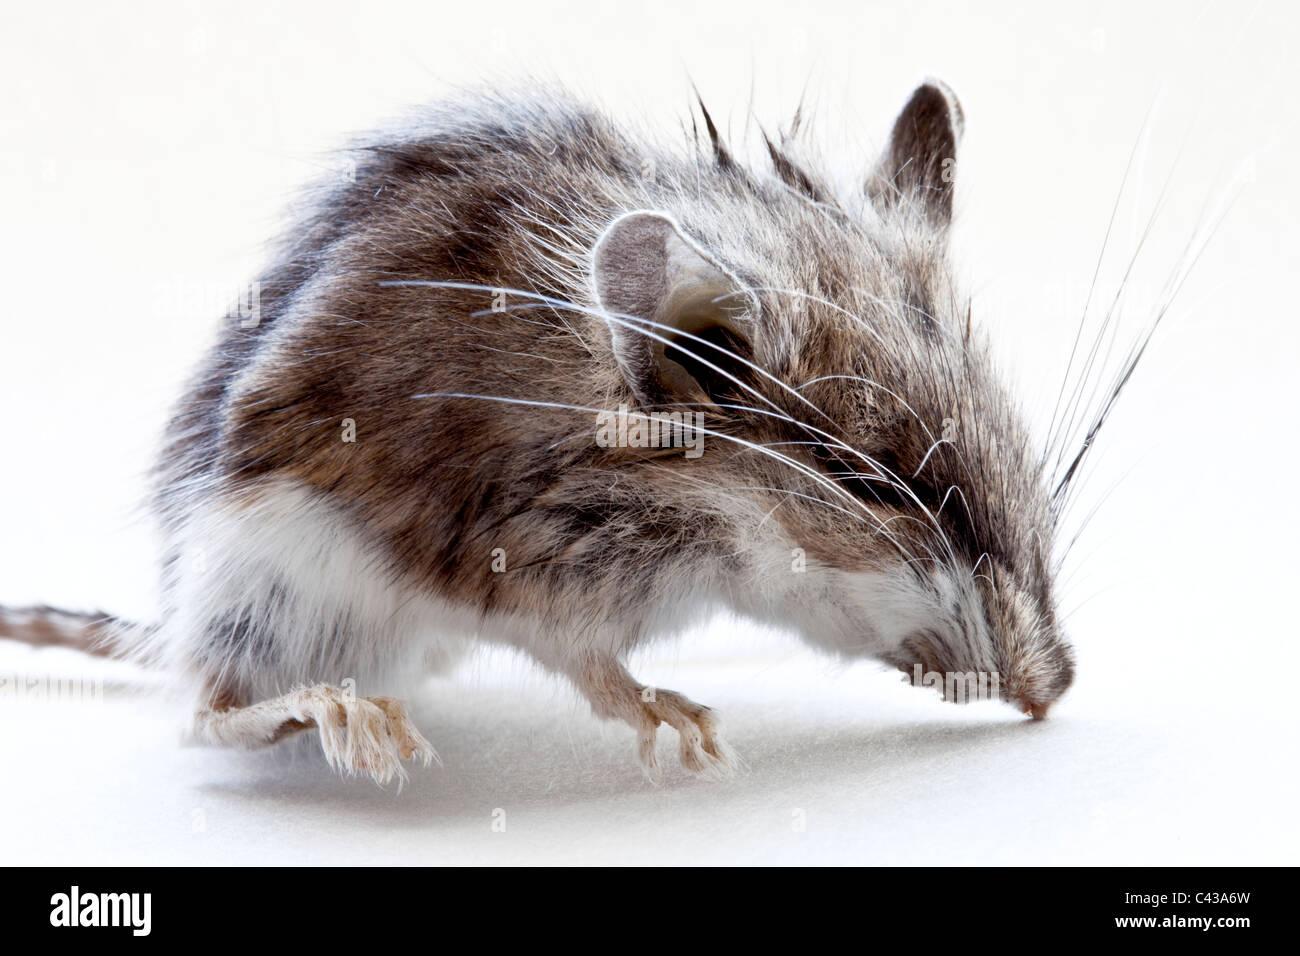 Immature dead field mouse, Stock Photo